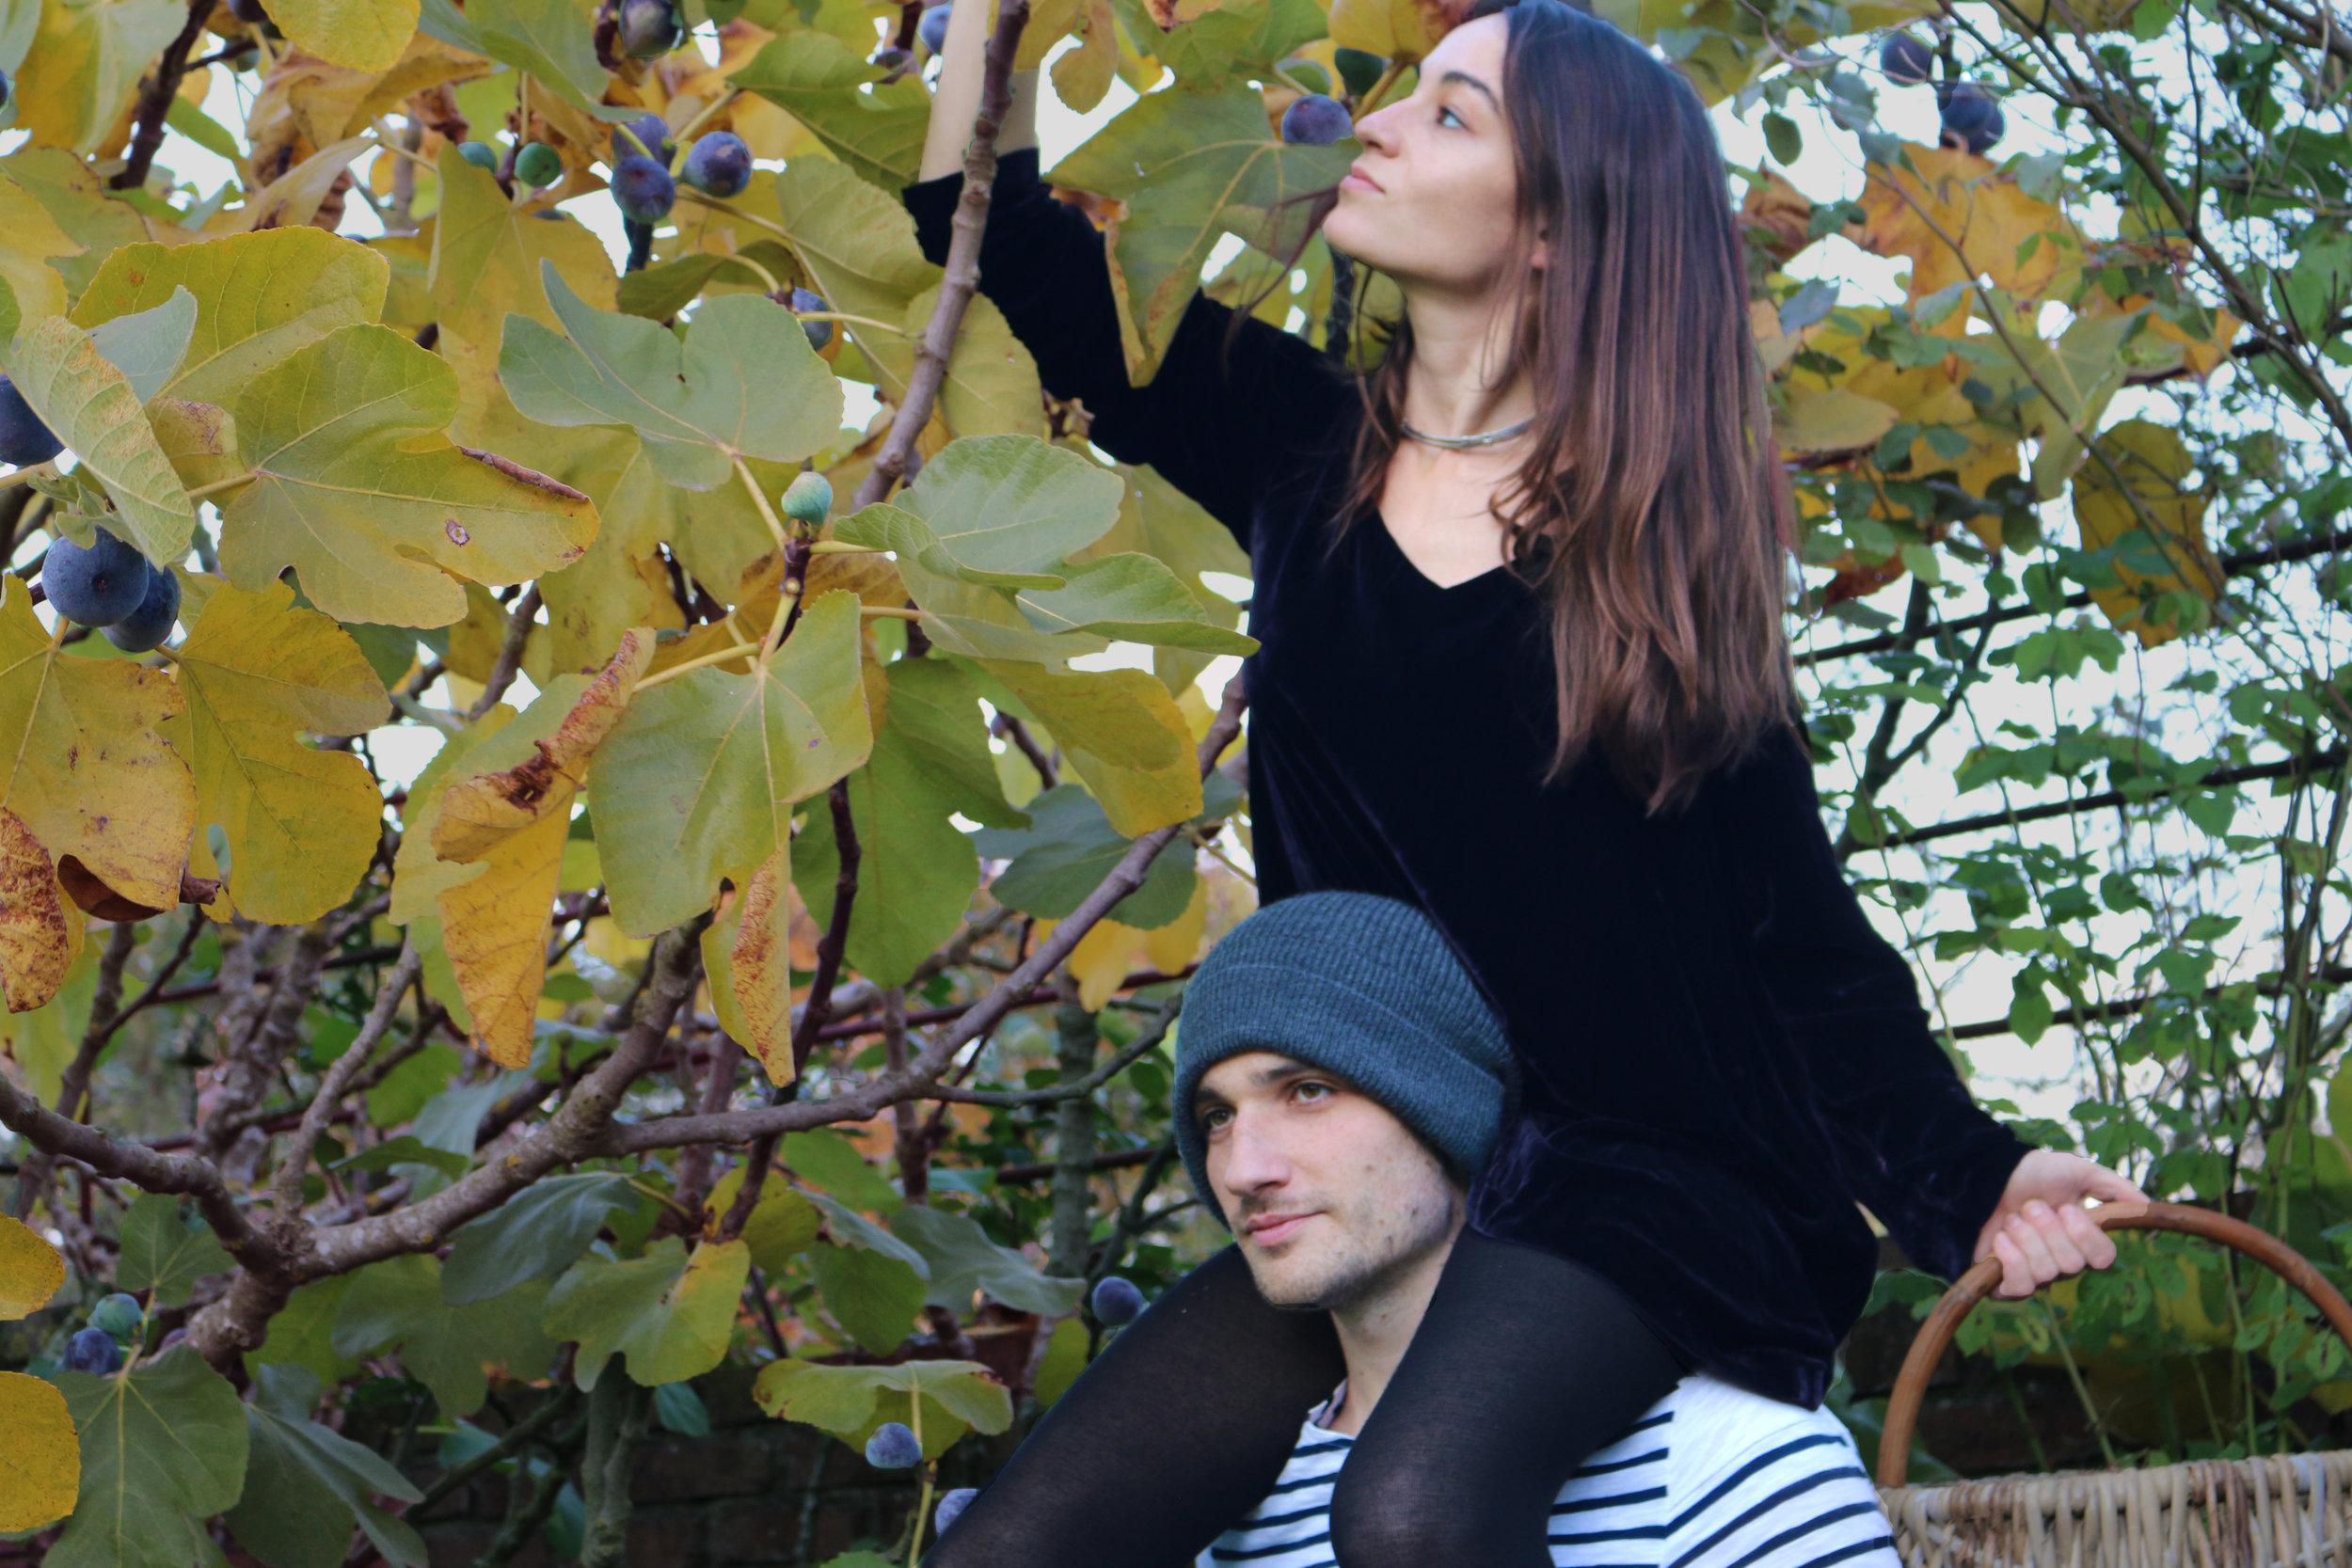 Figs-Gruyere-GourmandeSante-LisannaWallance